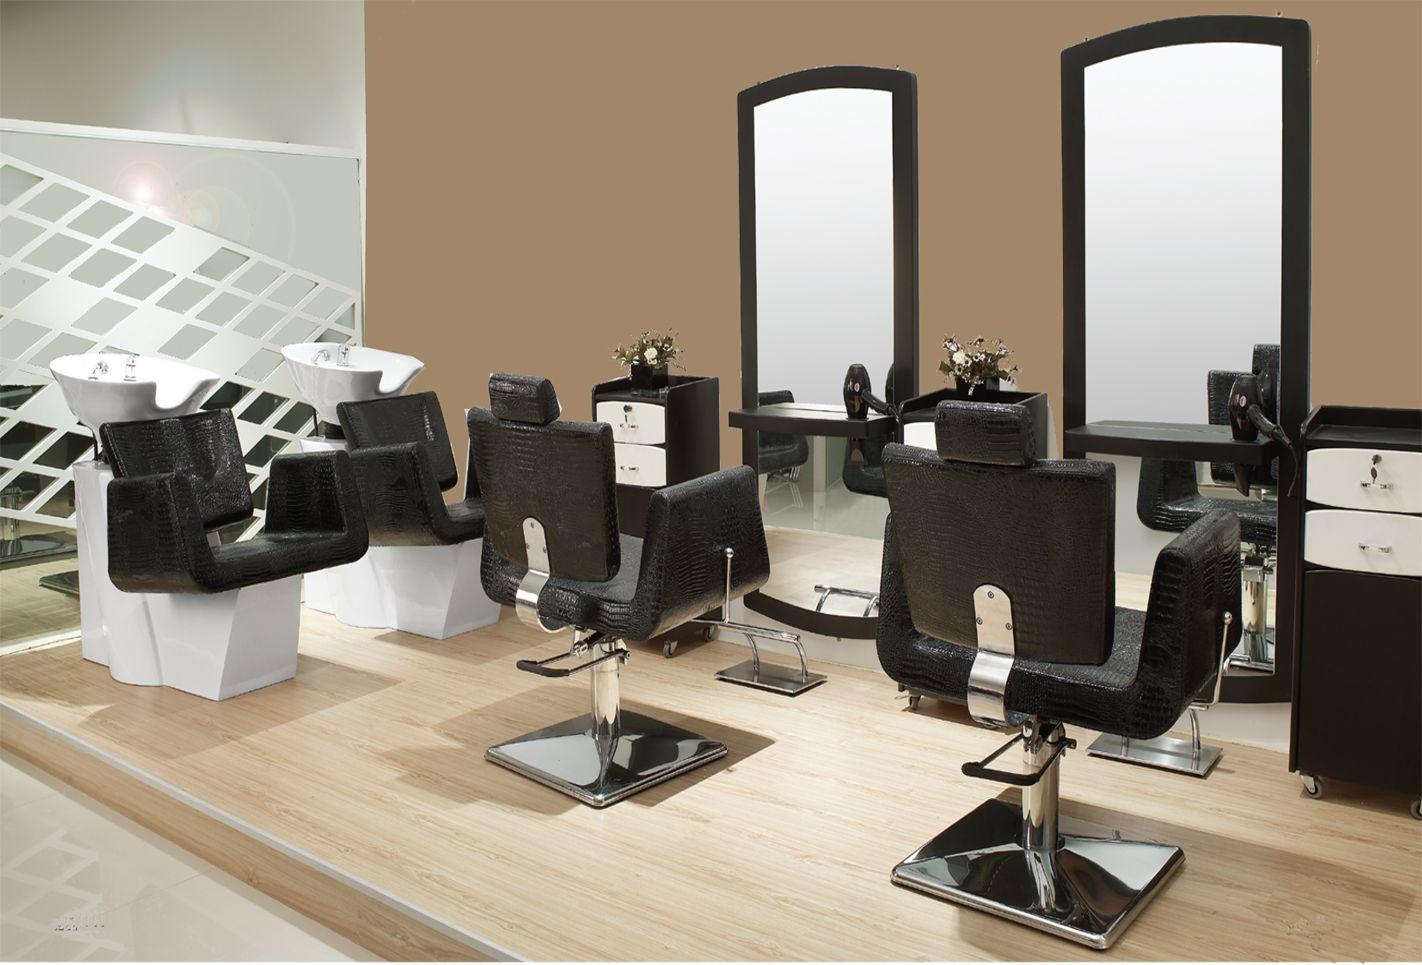 # Beauty Salon equipment   Ideas for future salon business ...